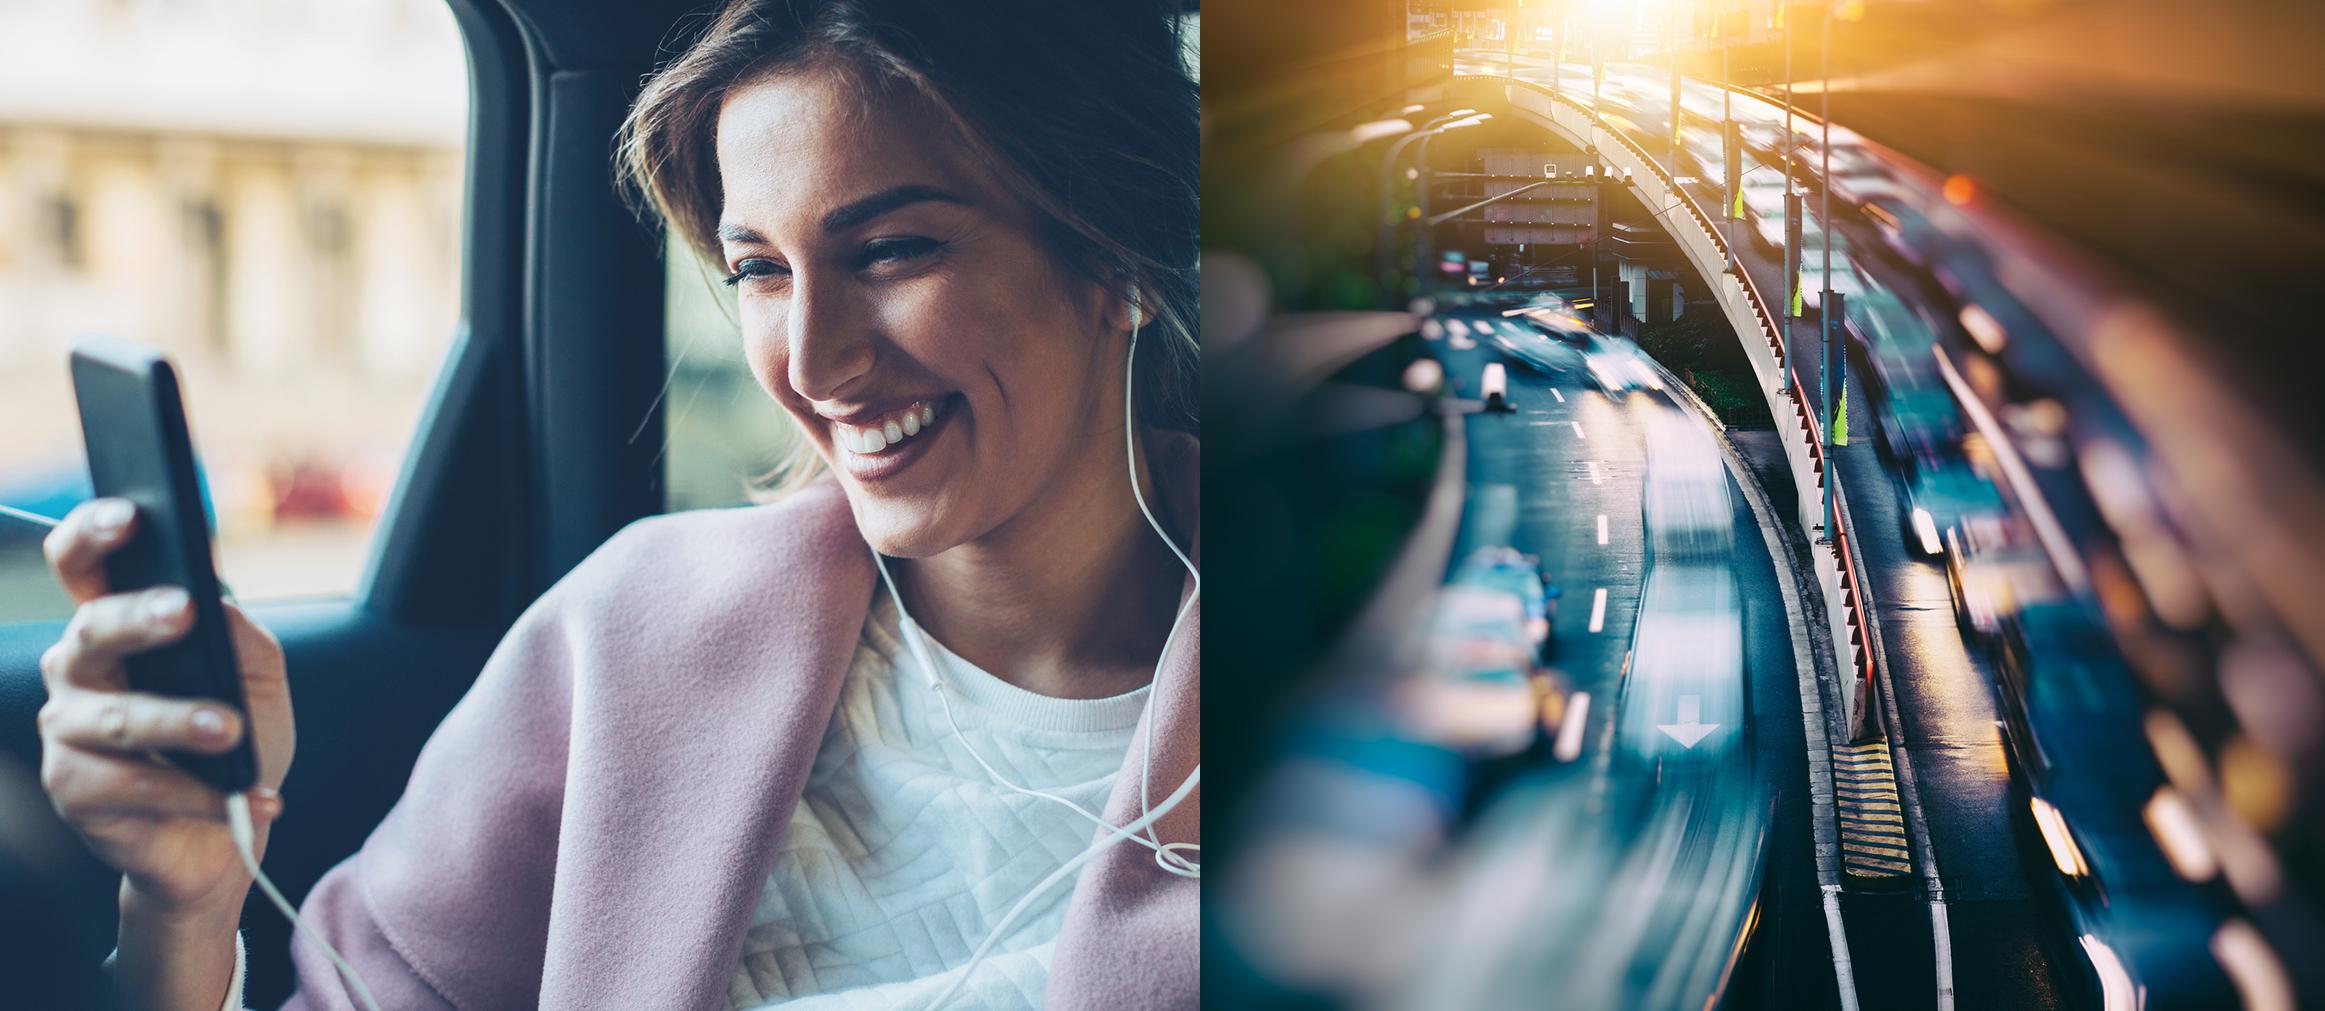 Auto-(Mobil) - Smartphone im Auto